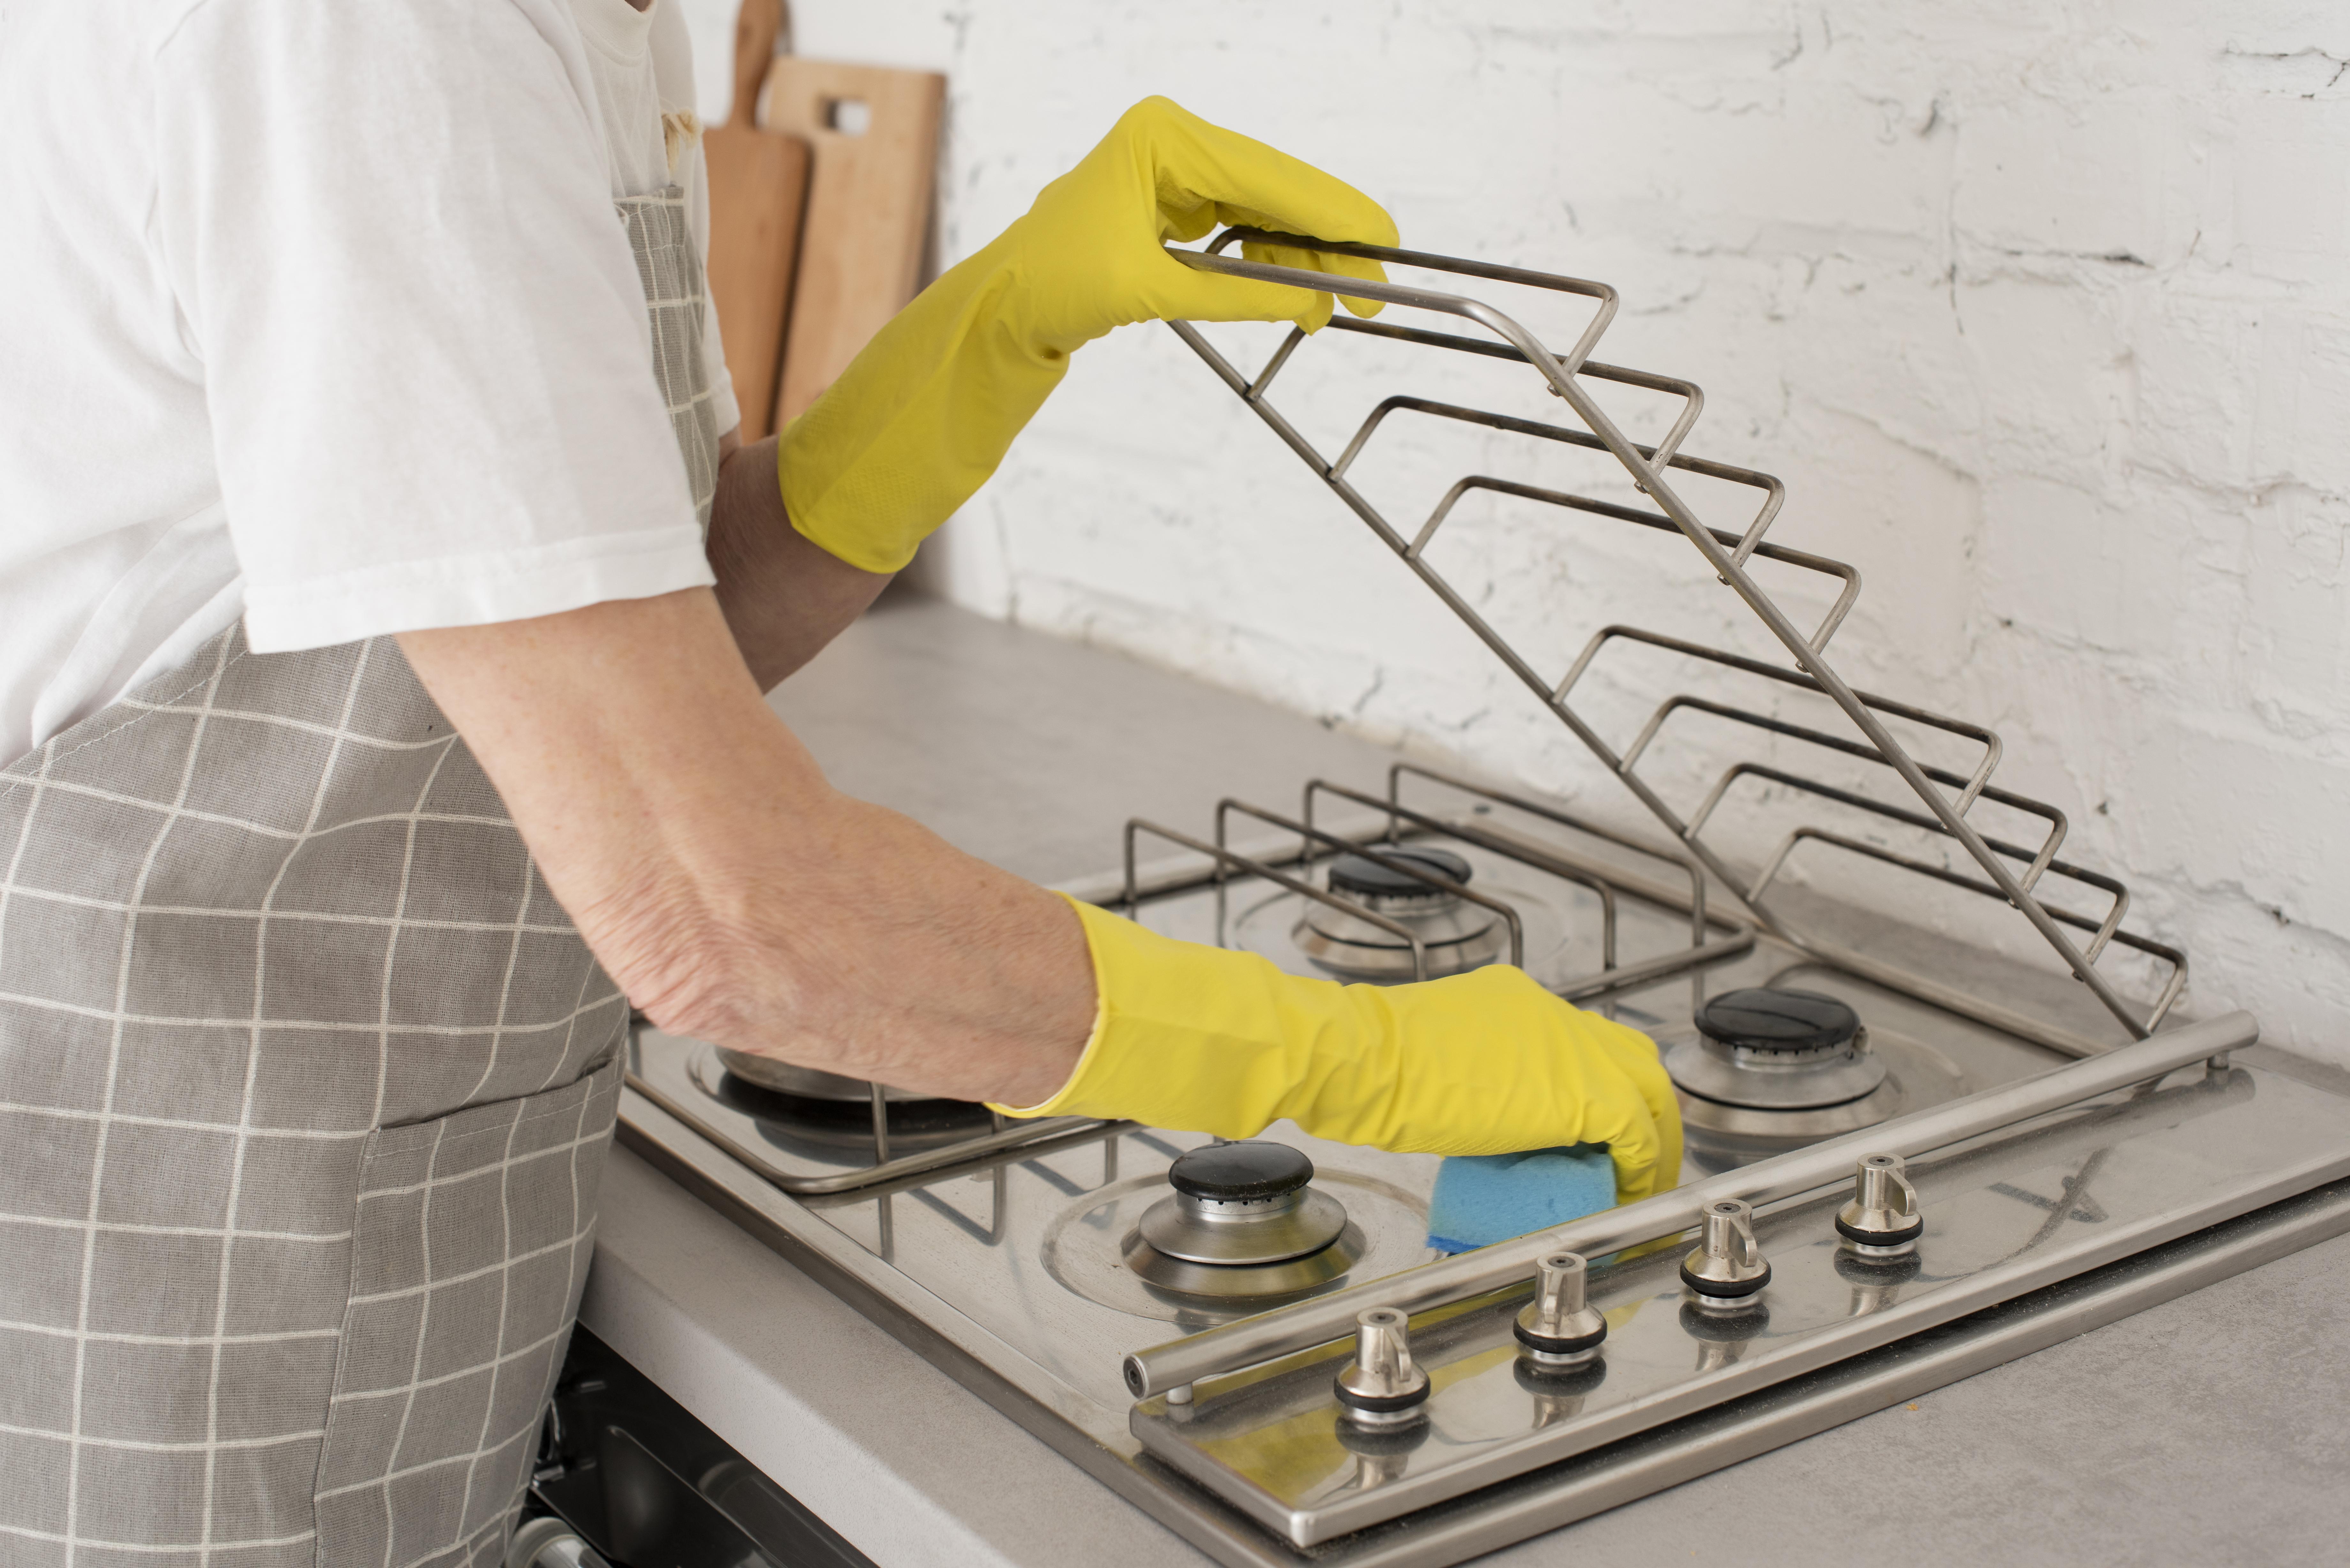 como limpar cooktop de vidro